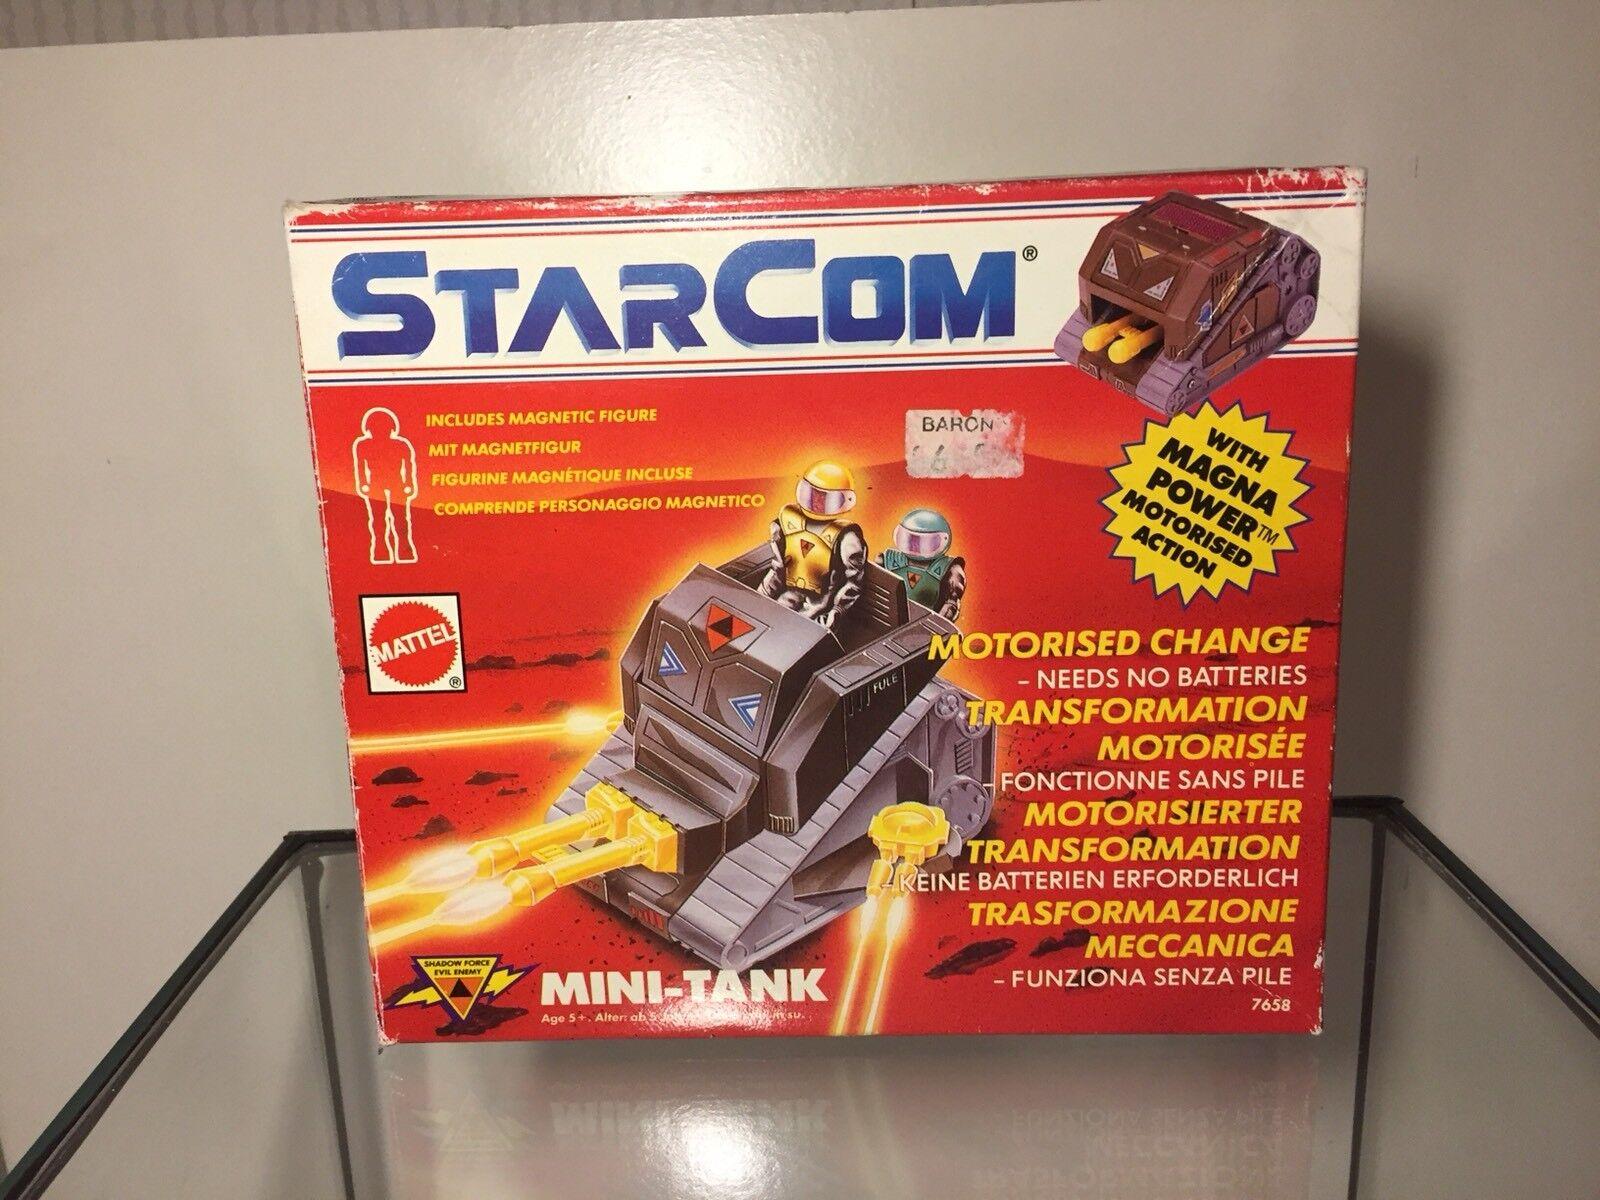 StarCom Mini Tank Box Only❗️Ultra Rar❗️